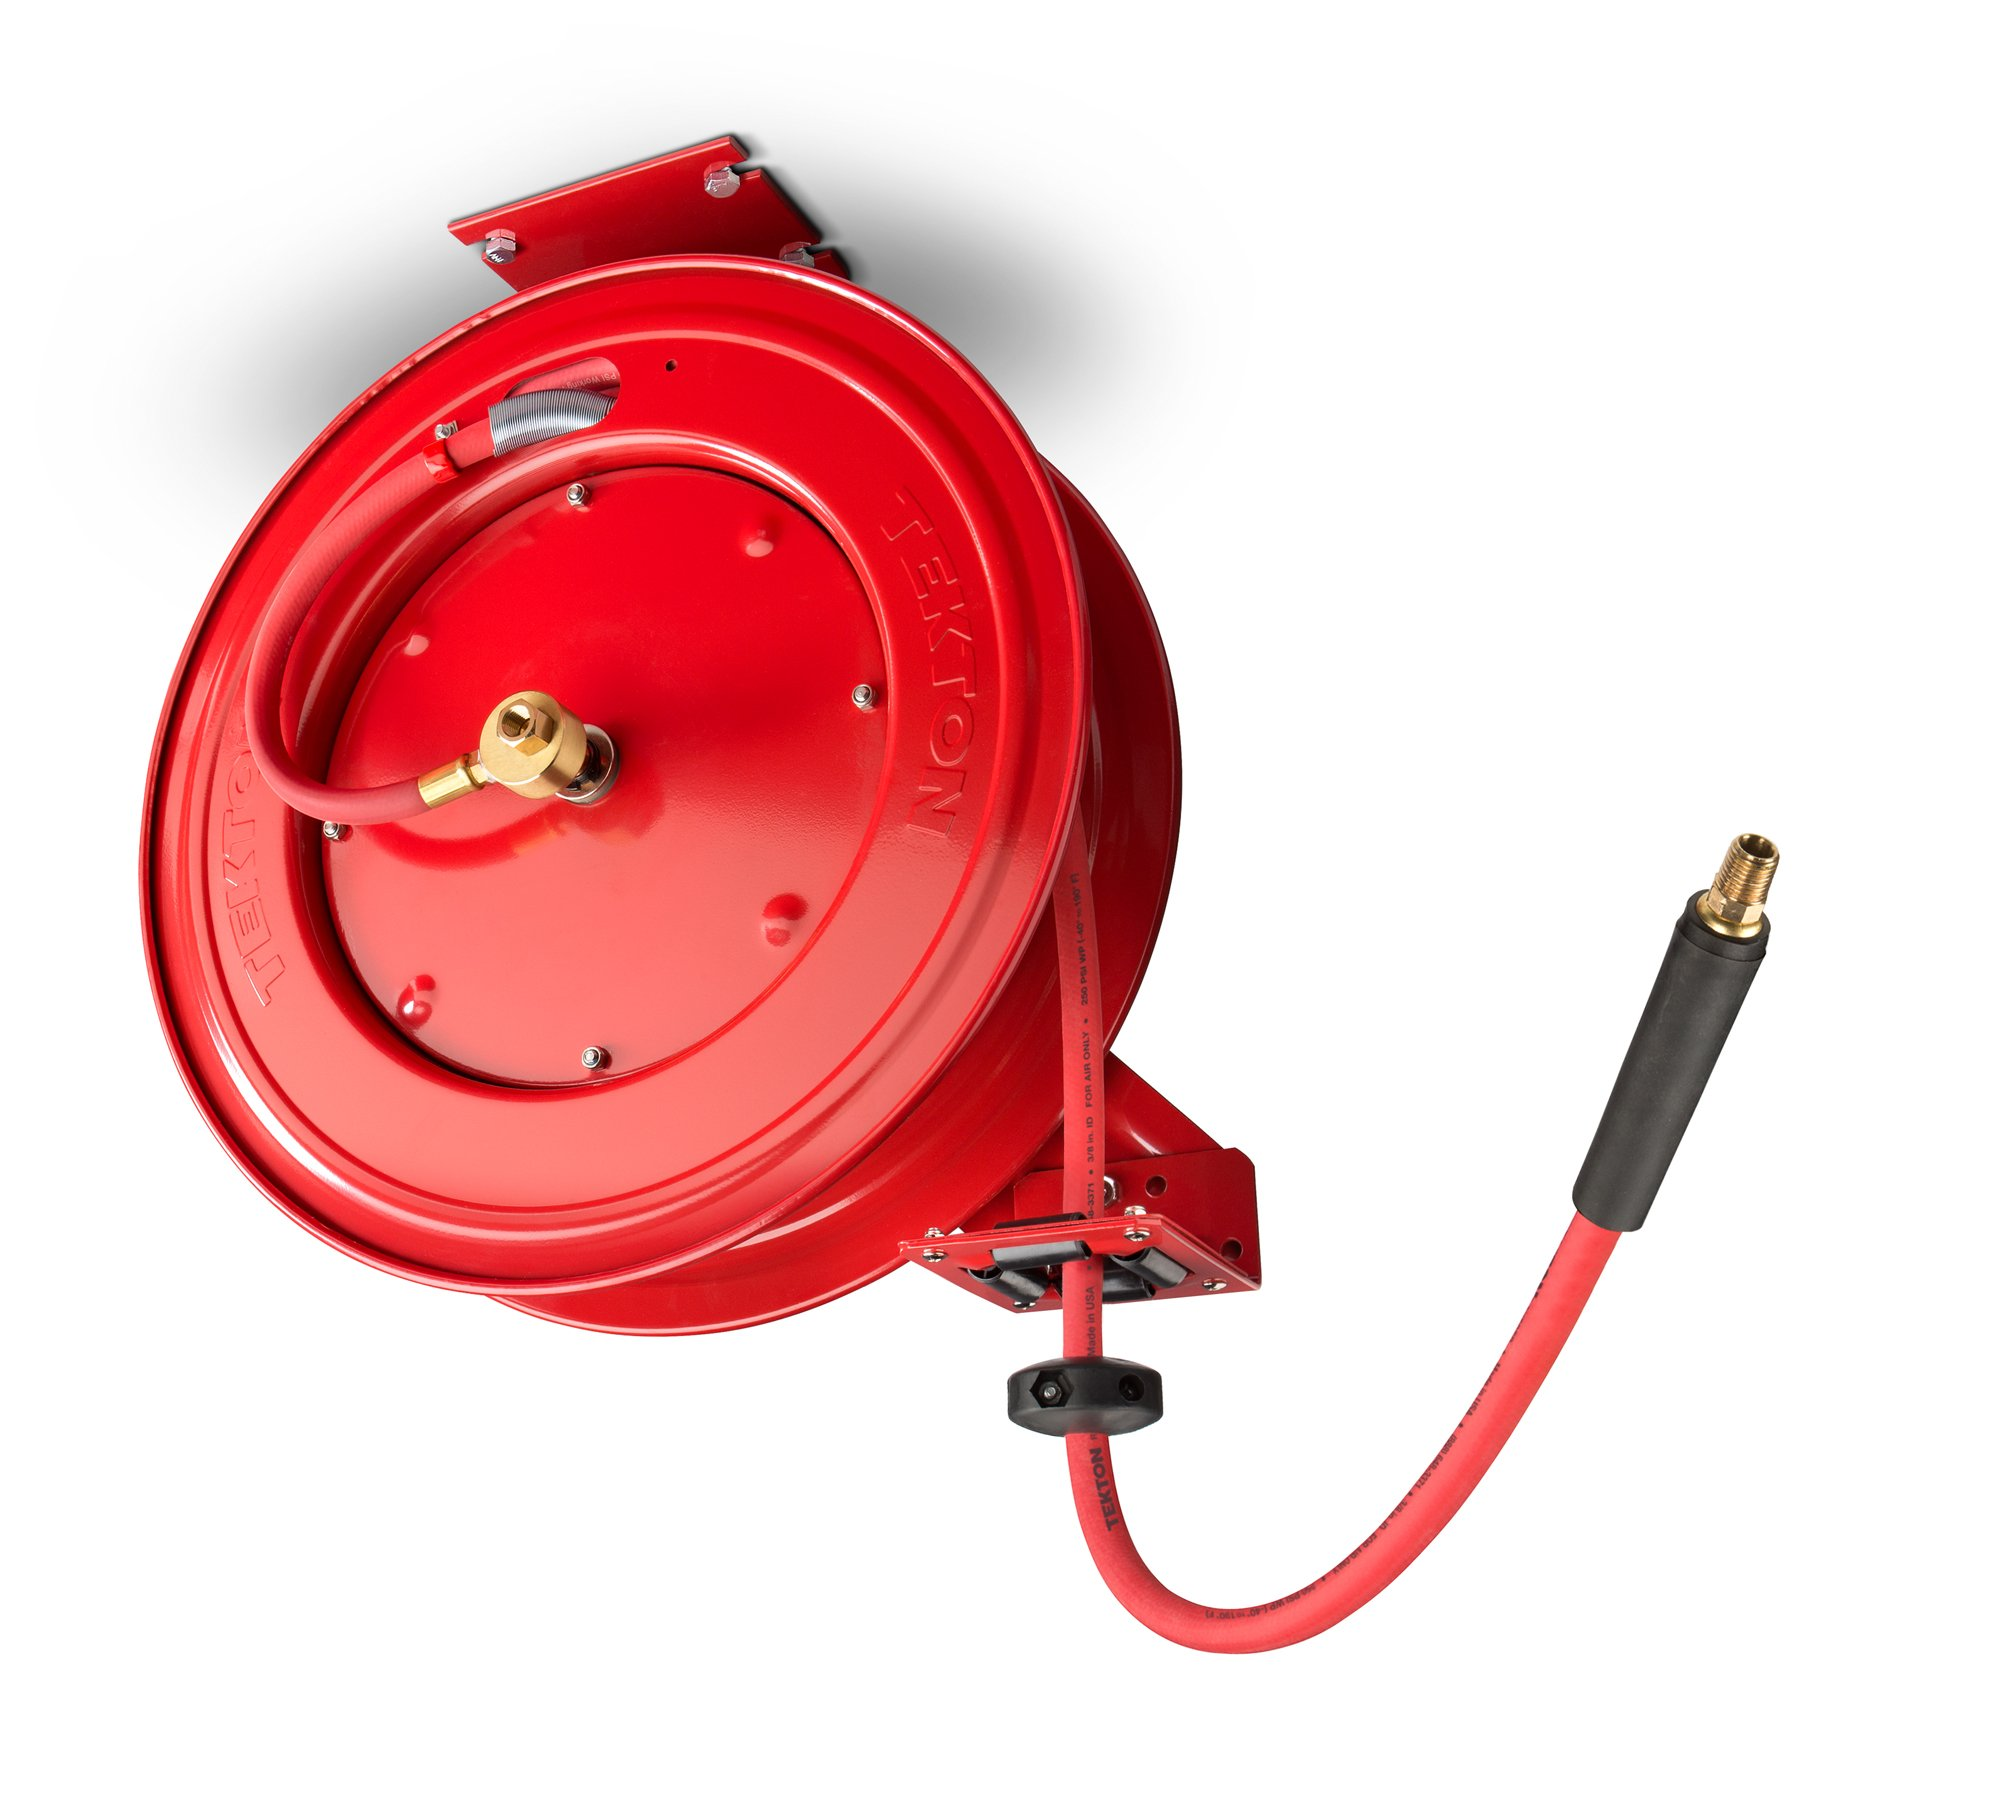 TEKTON 50-Foot x 3/8-Inch I.D. Auto Rewind Air Hose Reel (250 PSI) | 46845